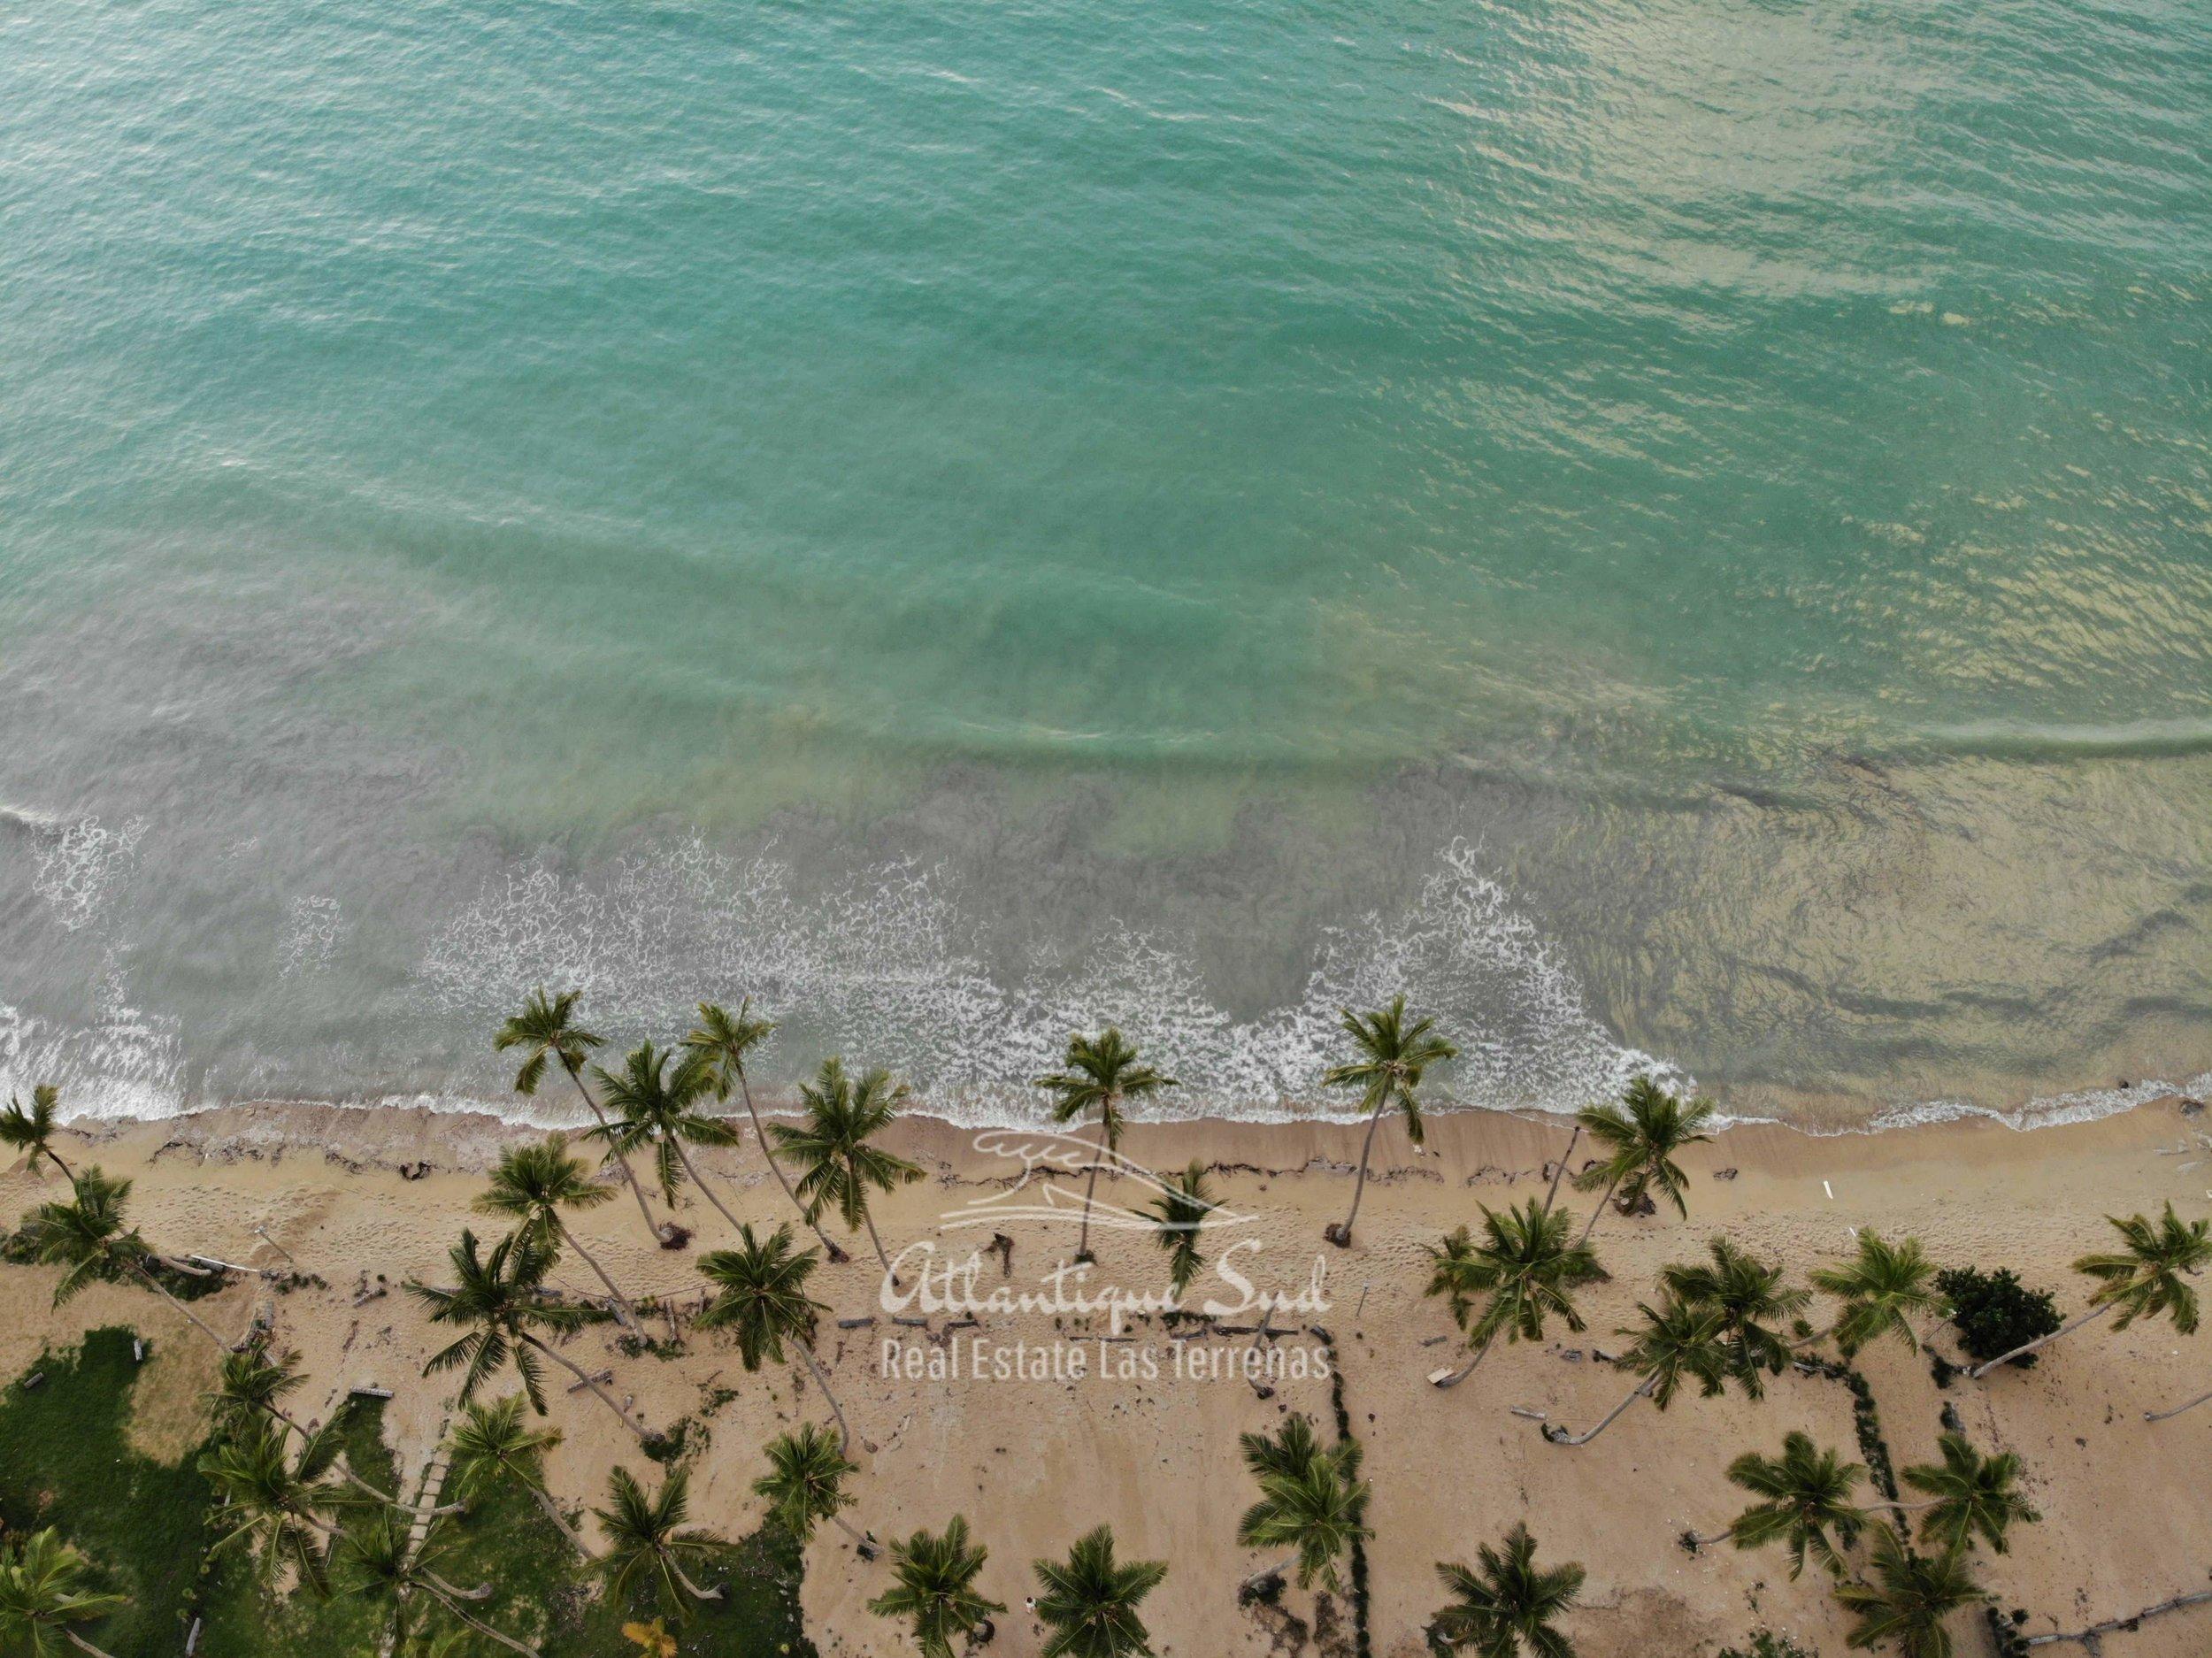 Villa los nomadas for sale beachfront5.jpg